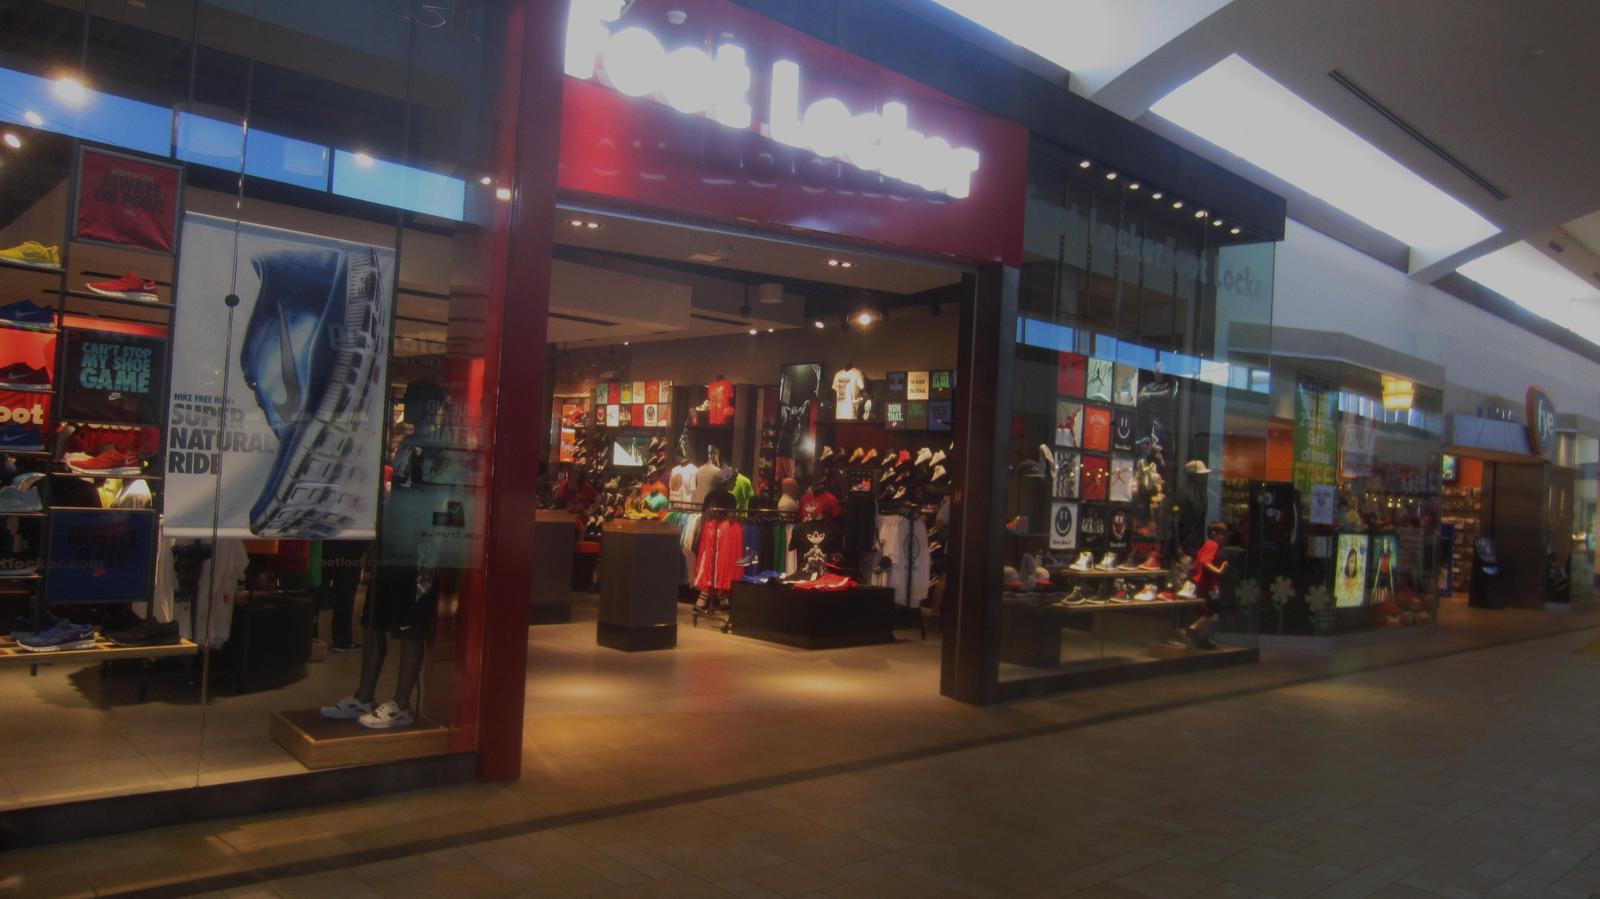 Footlocker Store by MetalGriffen69 Footlocker Store by MetalGriffen69. Footlocker Store by MetalGriffen69 on DeviantArt